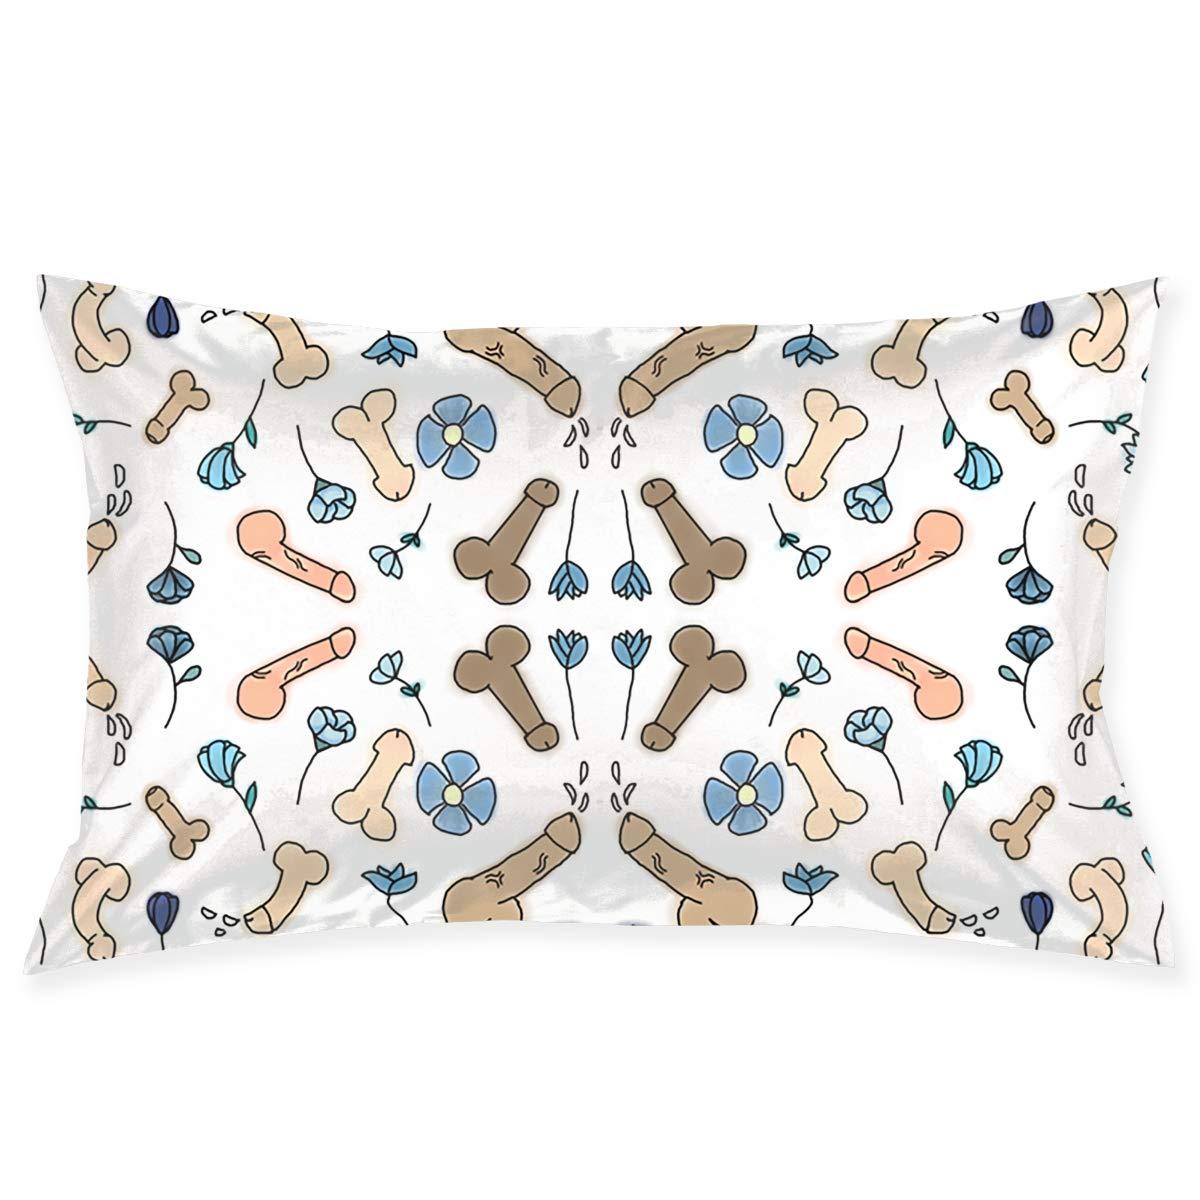 Amazon.com: JKEIL Pillow Case Penis Flower Printed Novelty ...